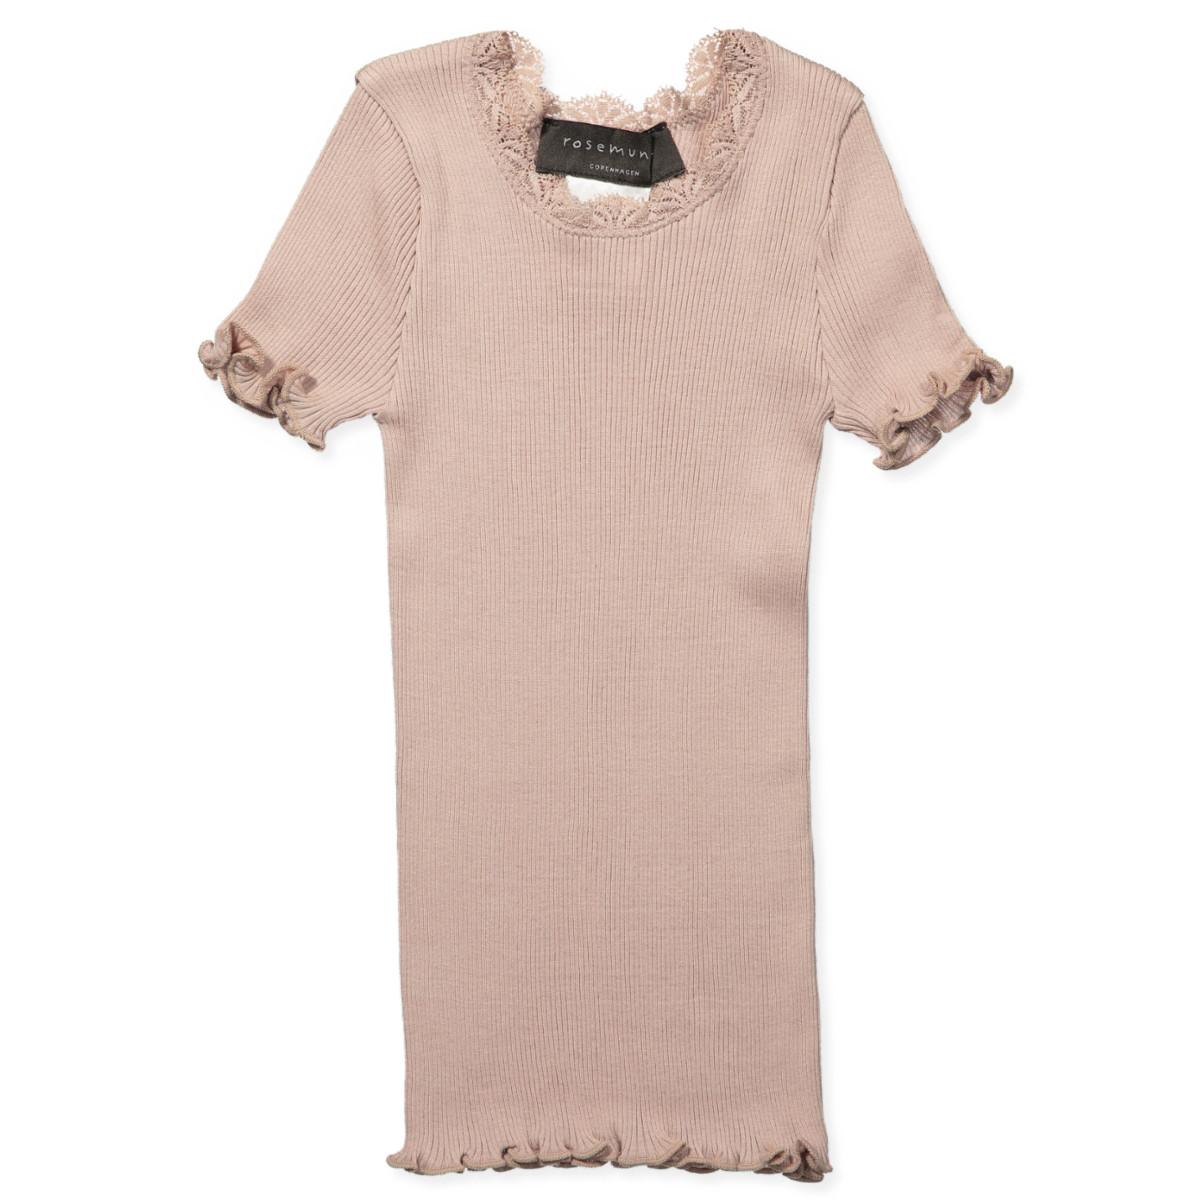 c891c6827c58cf Rosemunde - Navy silk t-shirt - Navy - House of Kids